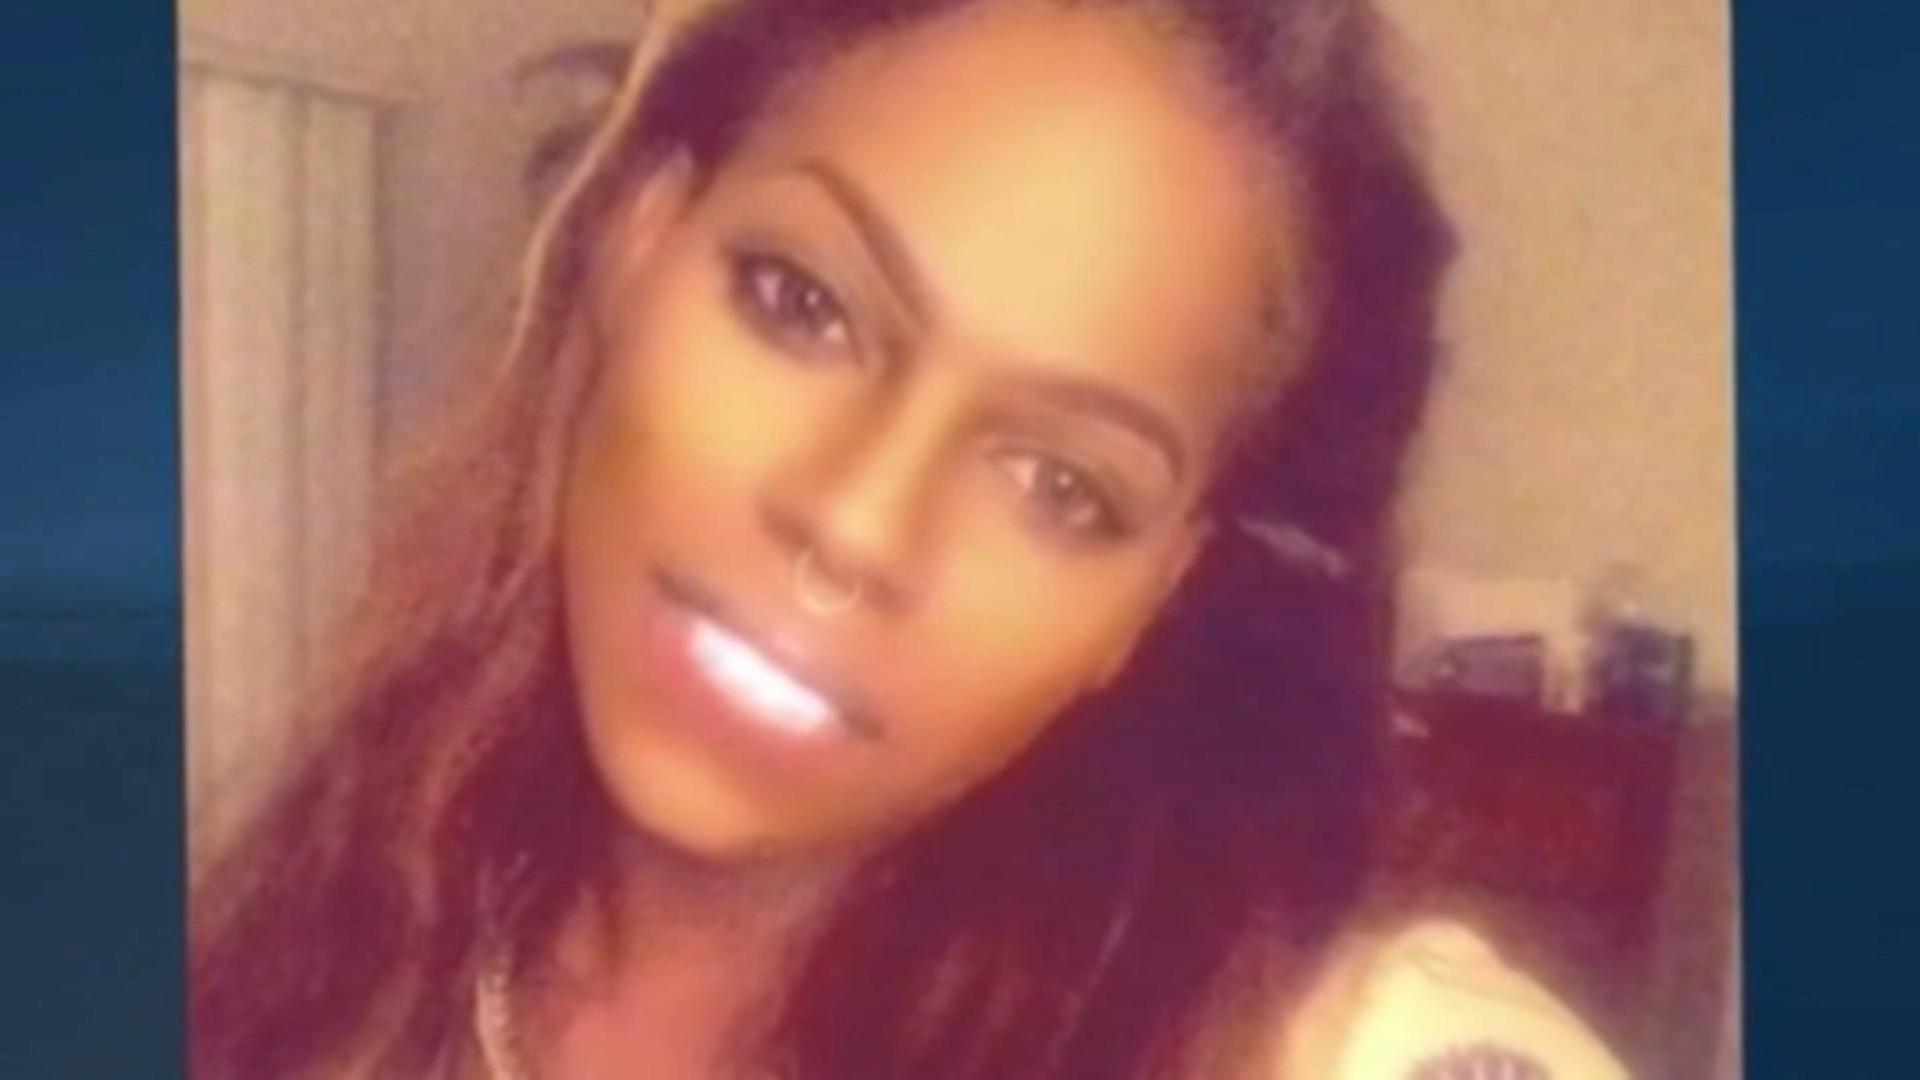 Man Sentenced to 35 Years in Murder of Transgender Woman